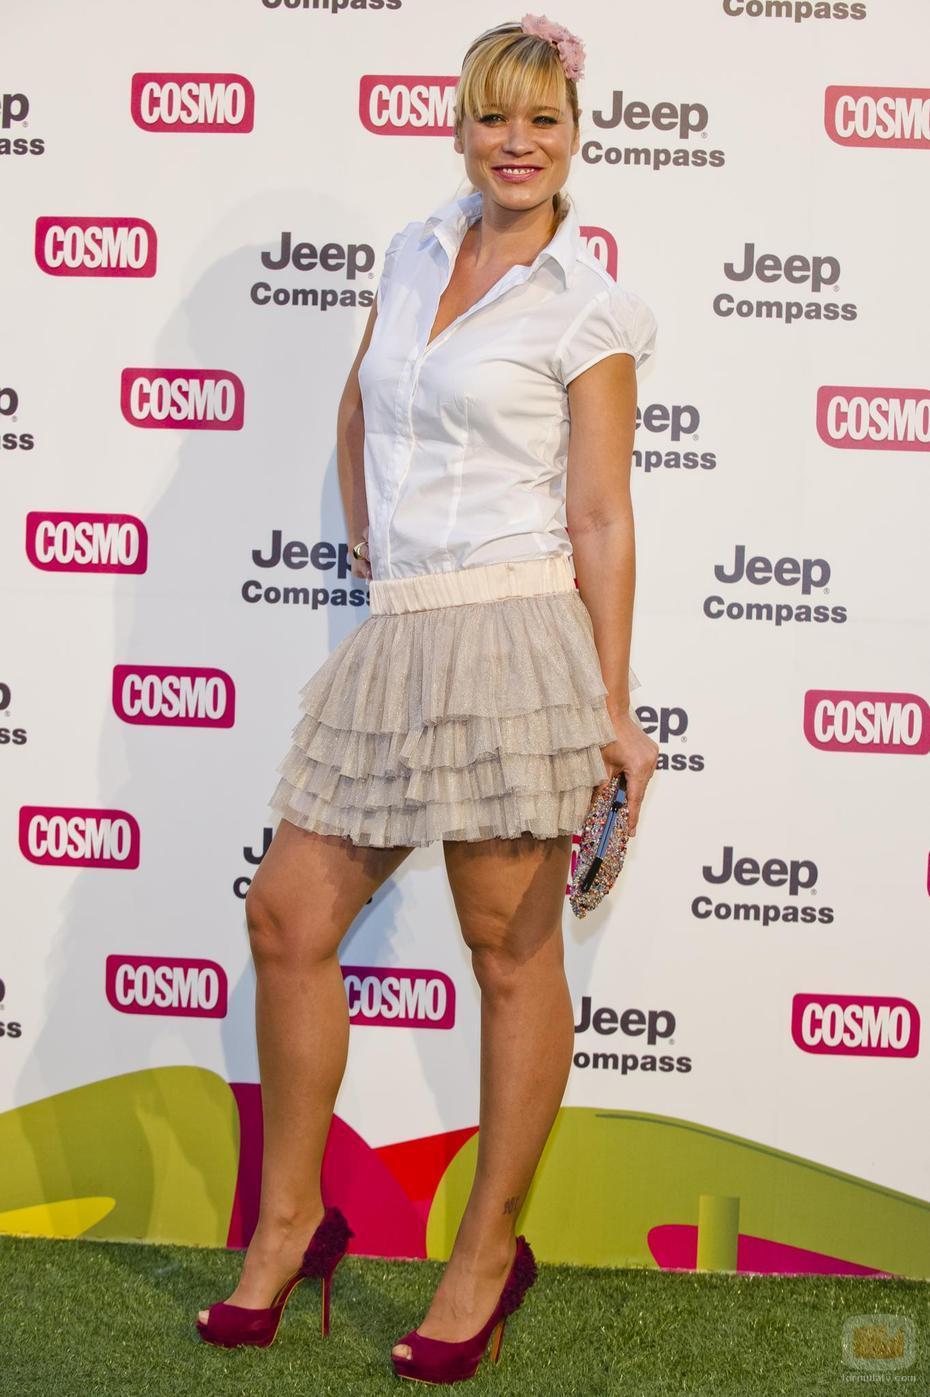 Hot Legs Carla Hidalgo  nudes (62 foto), iCloud, underwear